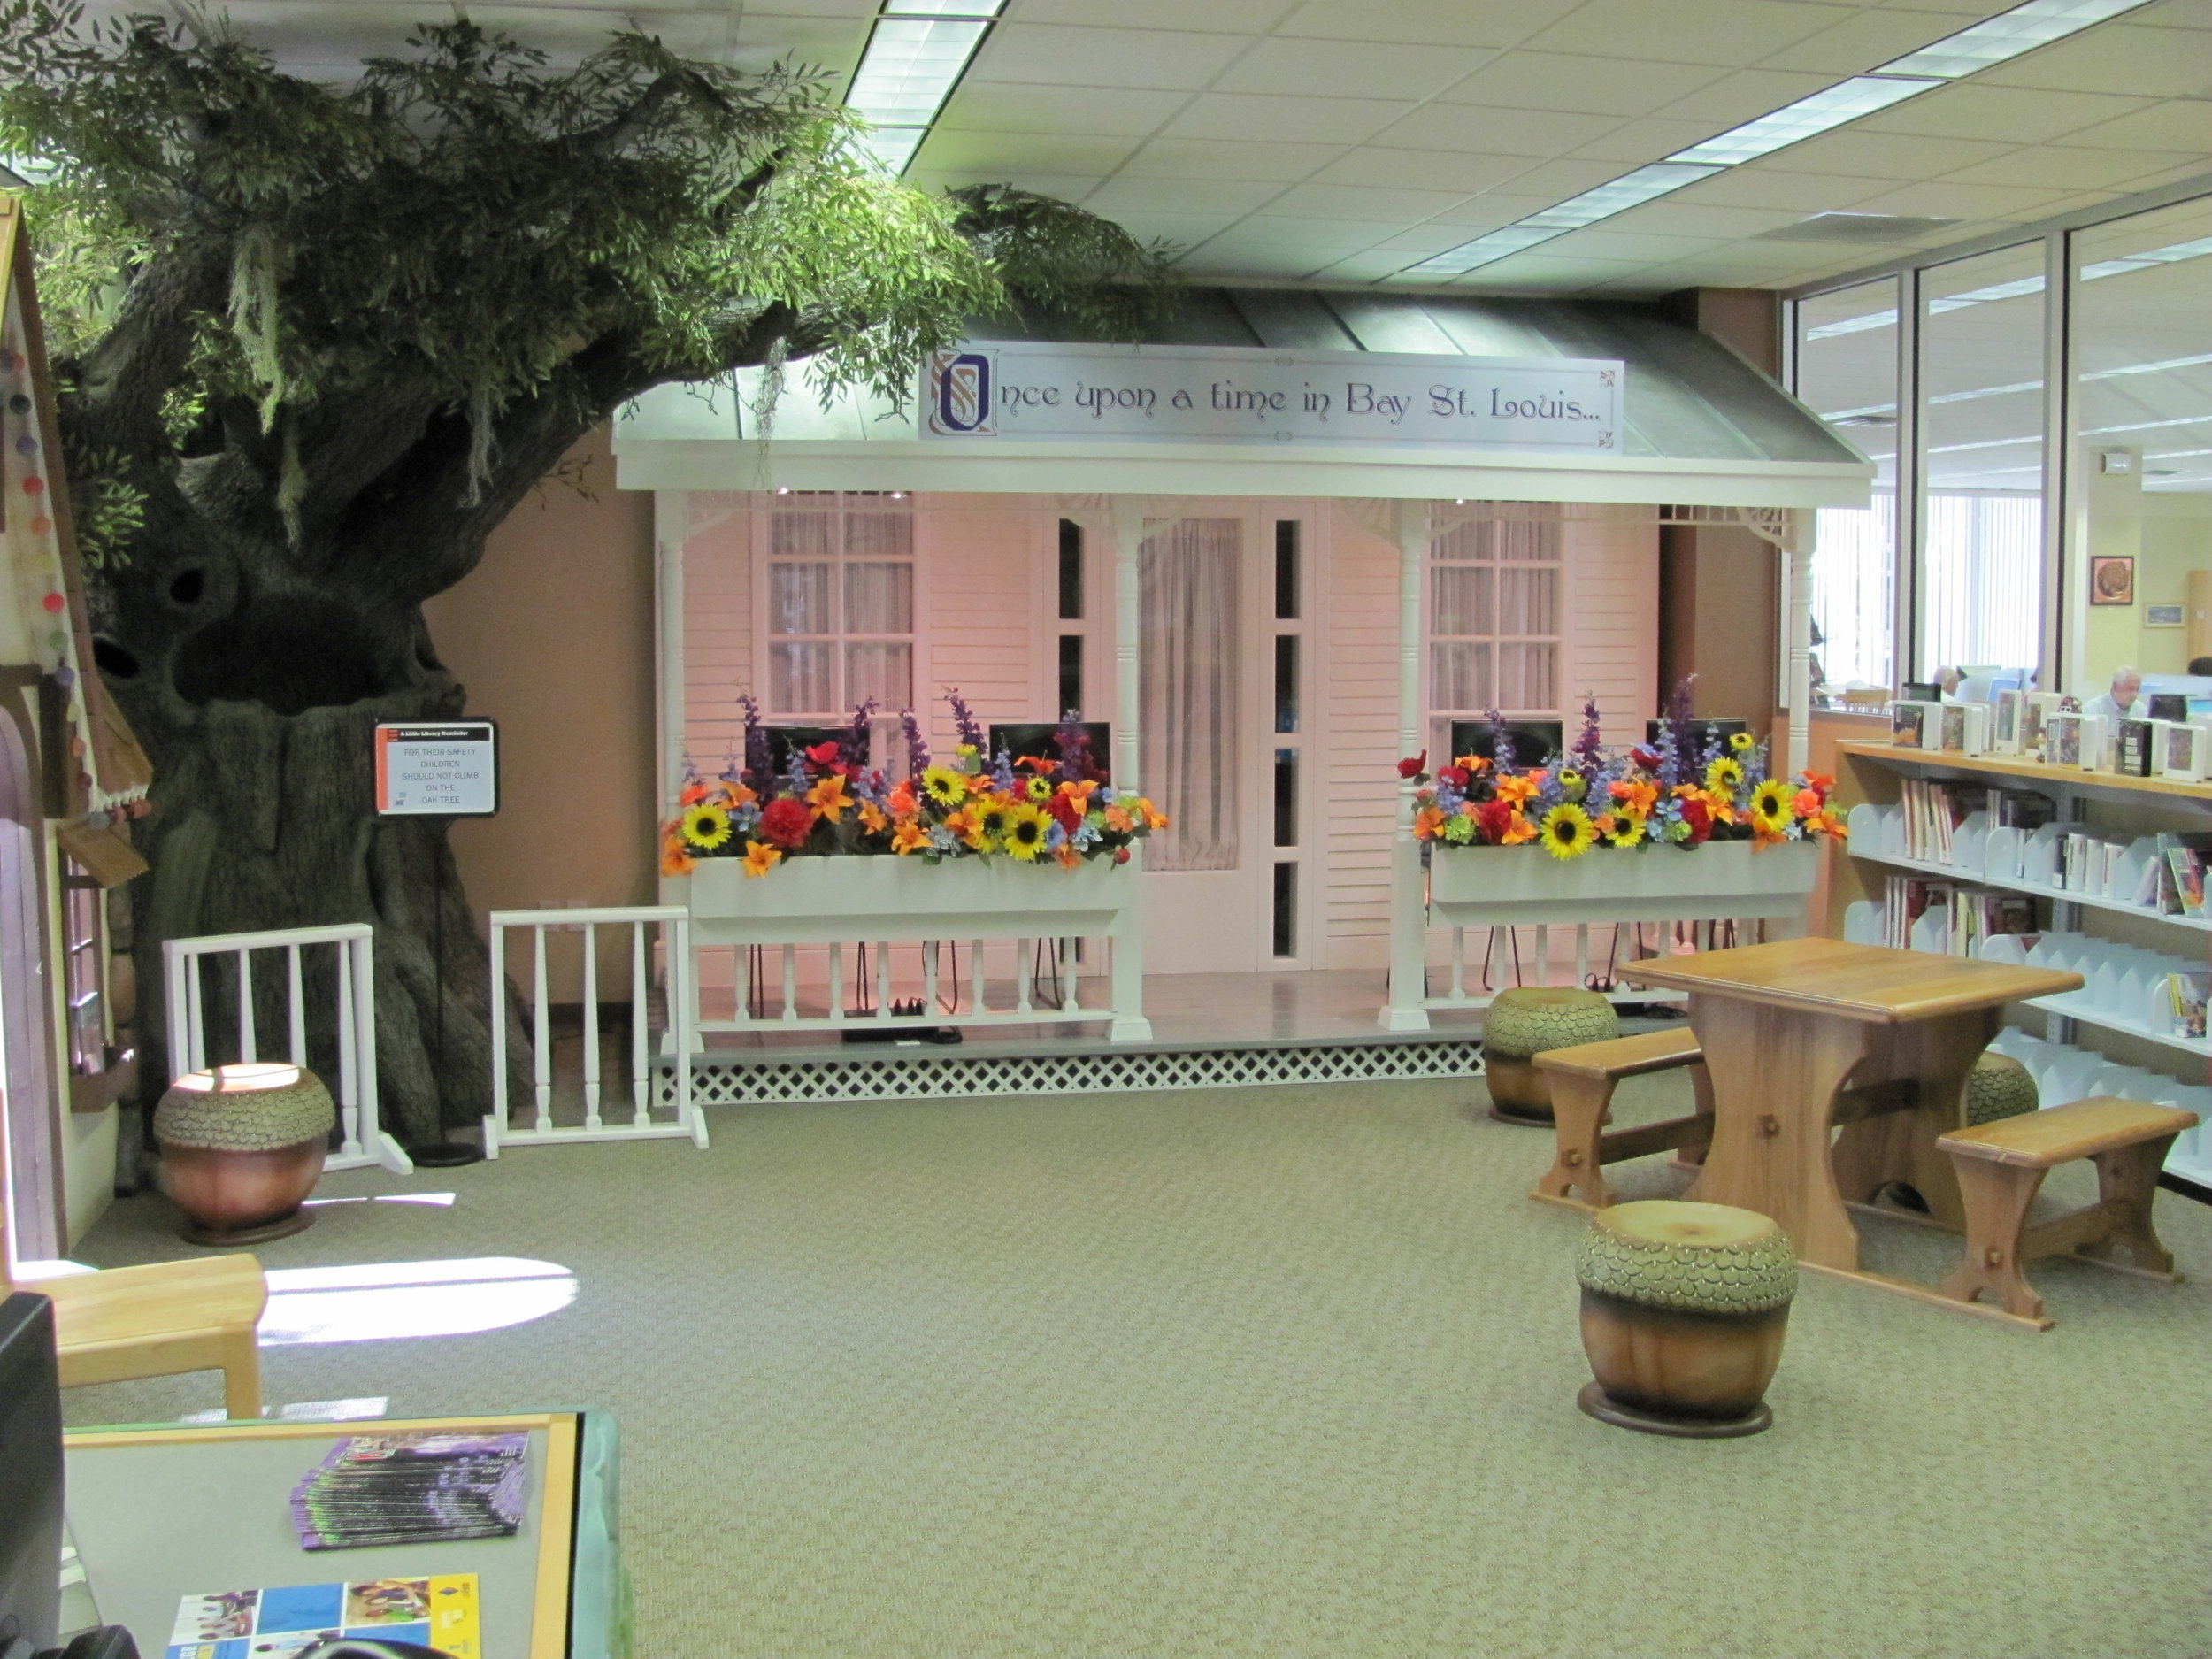 Bay St. Louis Public Library - Bay St. Louis, MS